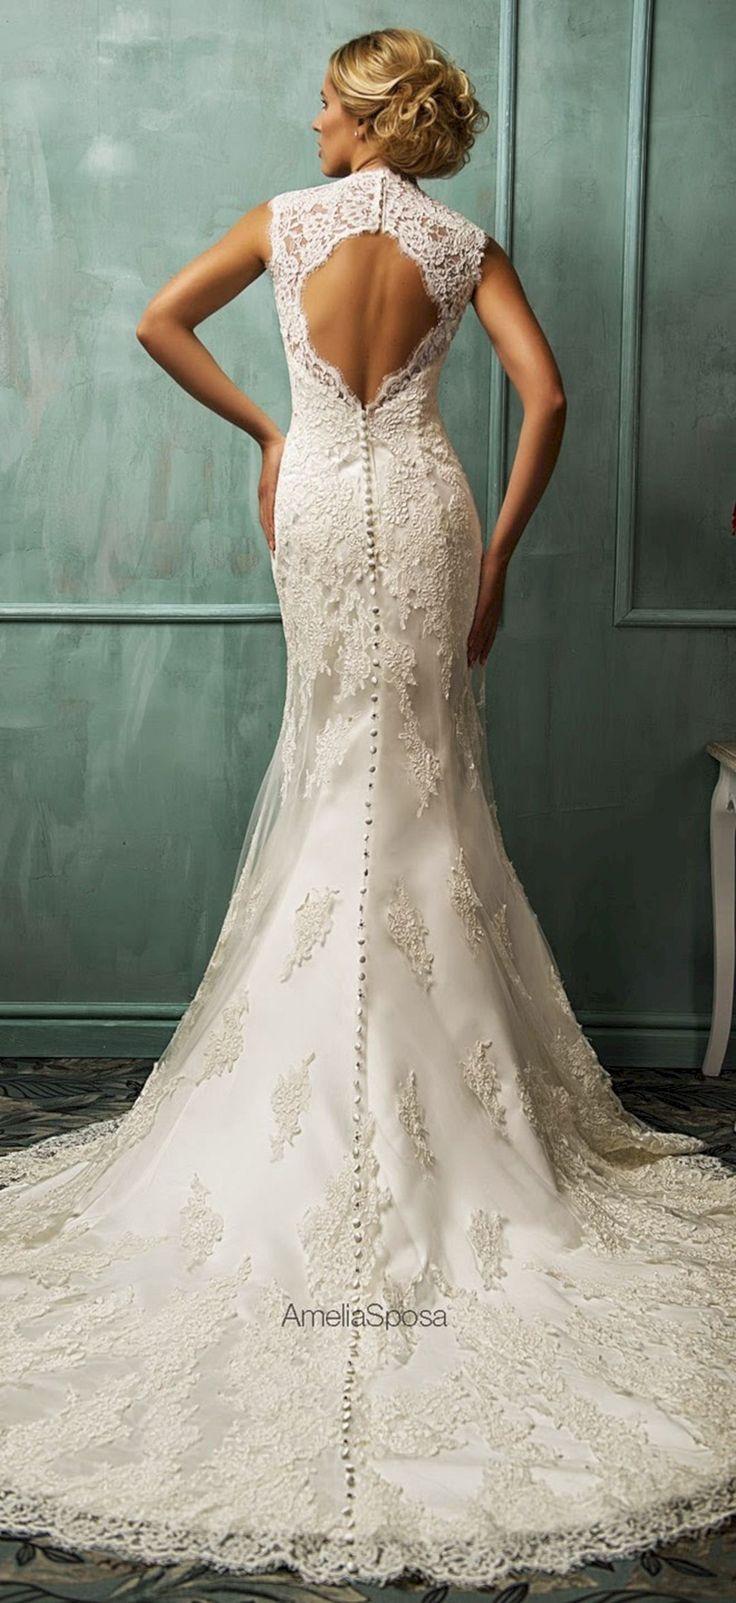 Best 20+ Exclusive Amelia Sposa Wedding Dress Collections  https://oosile.com/20-exclusive-amelia-sposa-wedding-dress-collections-16204